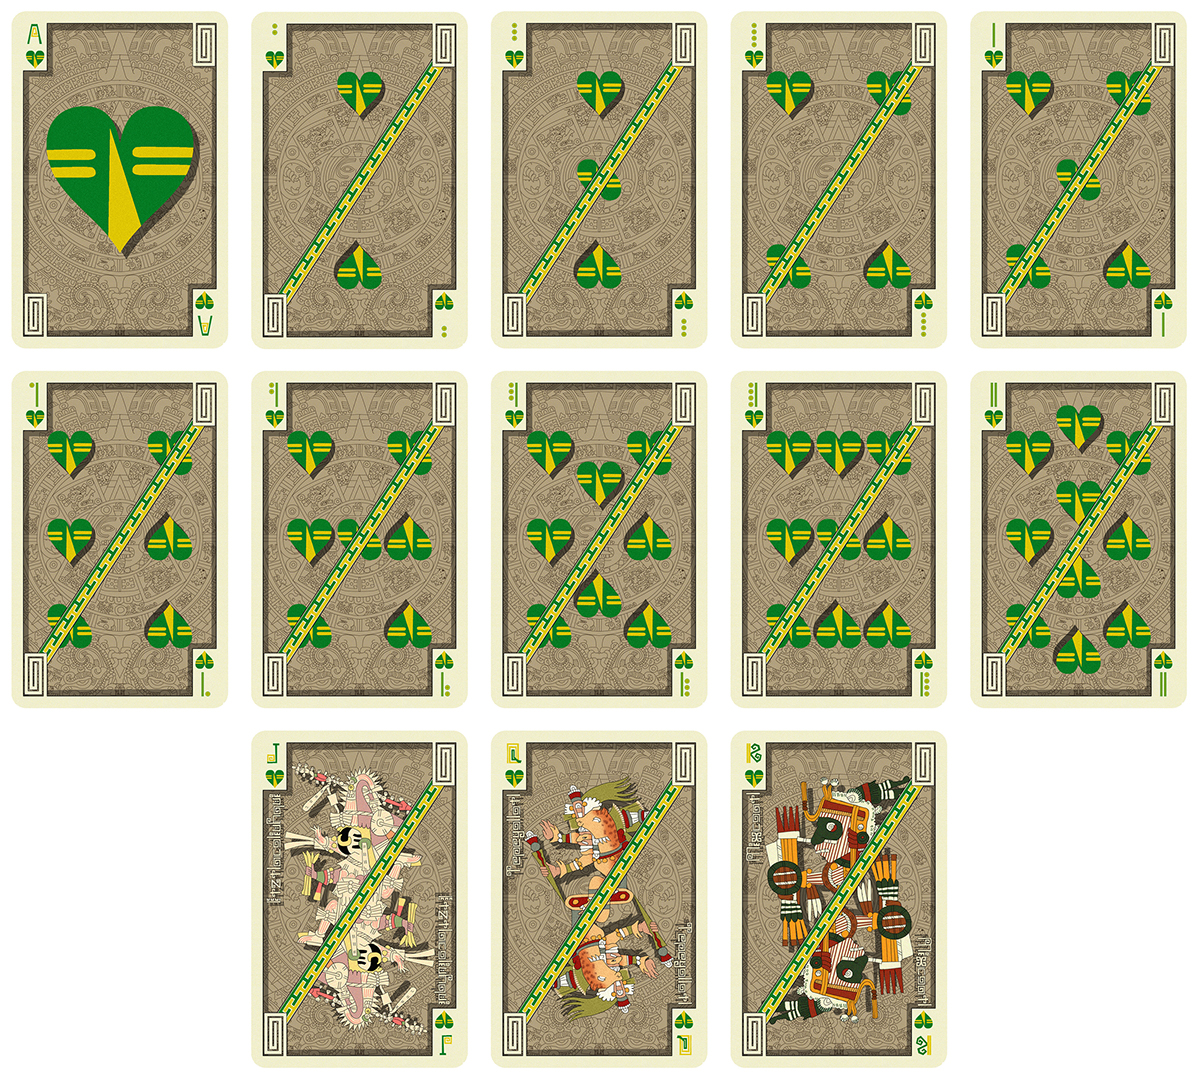 cards game,aztec,gods,mythology,Maya,inca,mexico,spades,clubs,diamonds,hearts,ouroboros,jack,queen,king